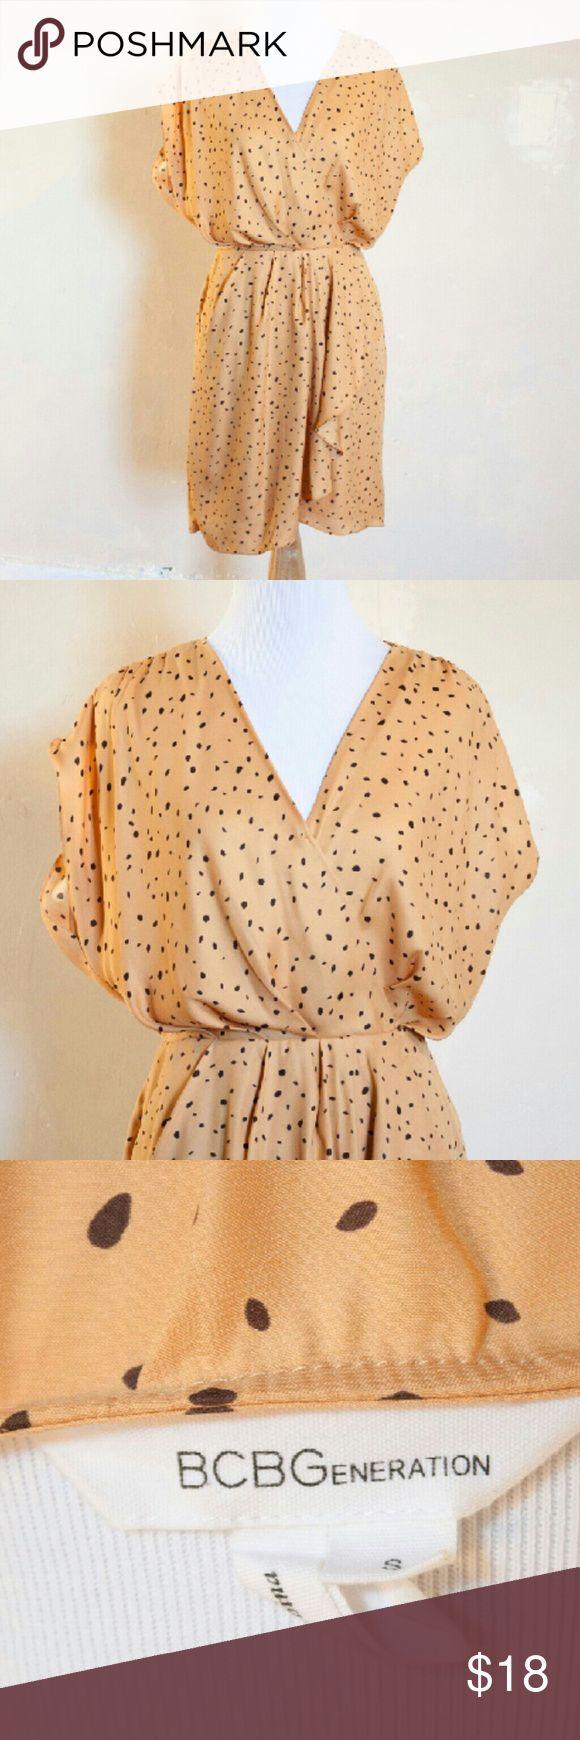 BCBGeneration Dress Very pretty pale yellow polka dot dress. BCBGeneration Dresses Midi